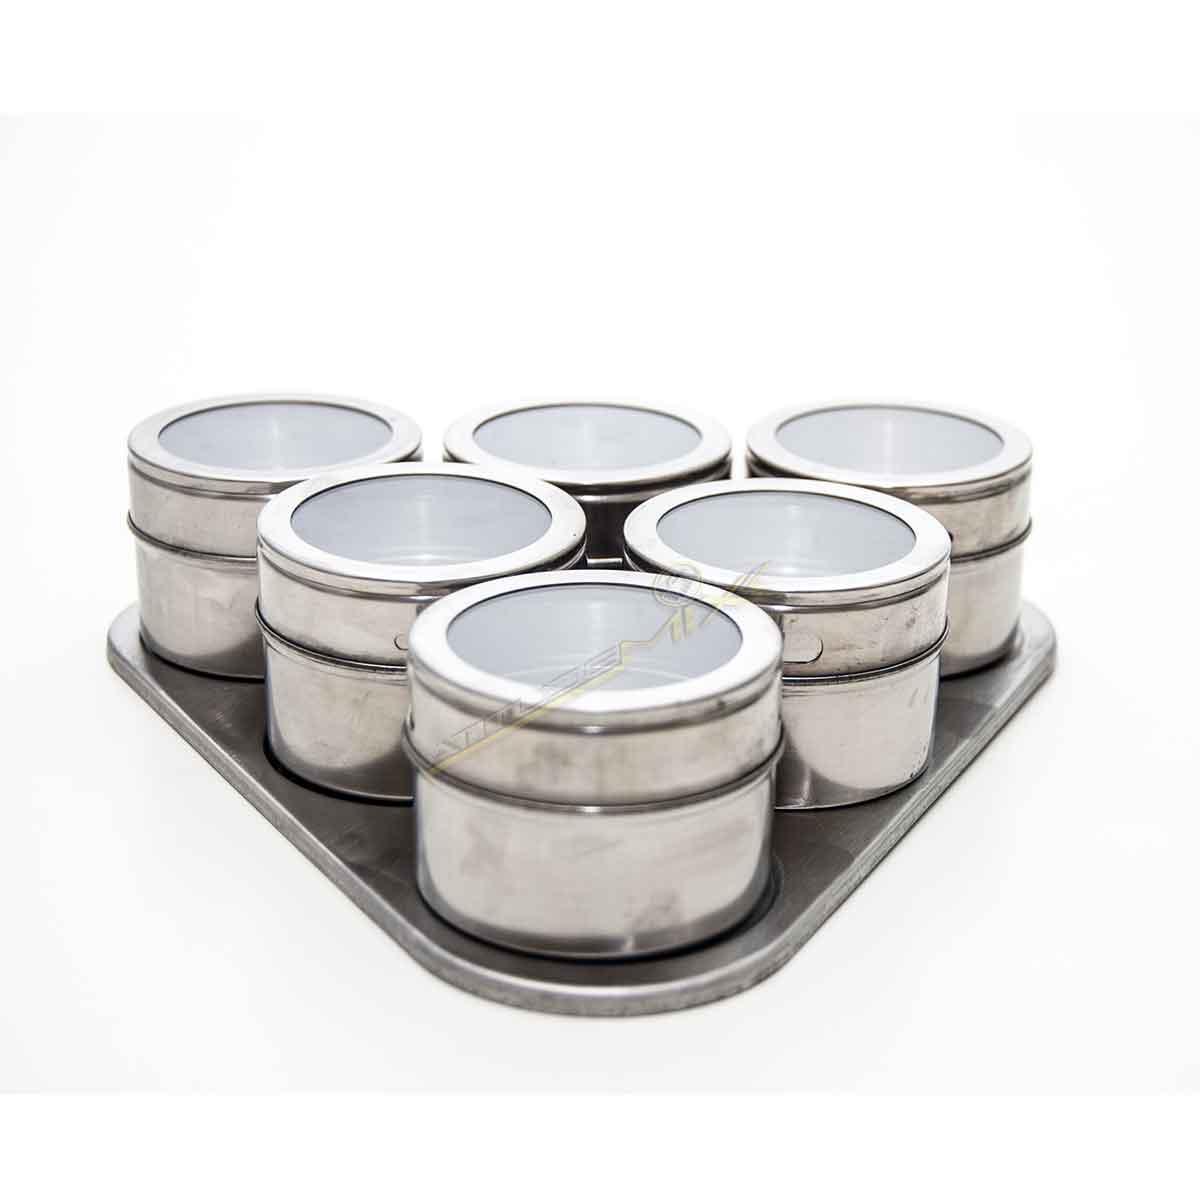 Porta Temperos E Condimentos Magnético Aço Inox 6 Potes